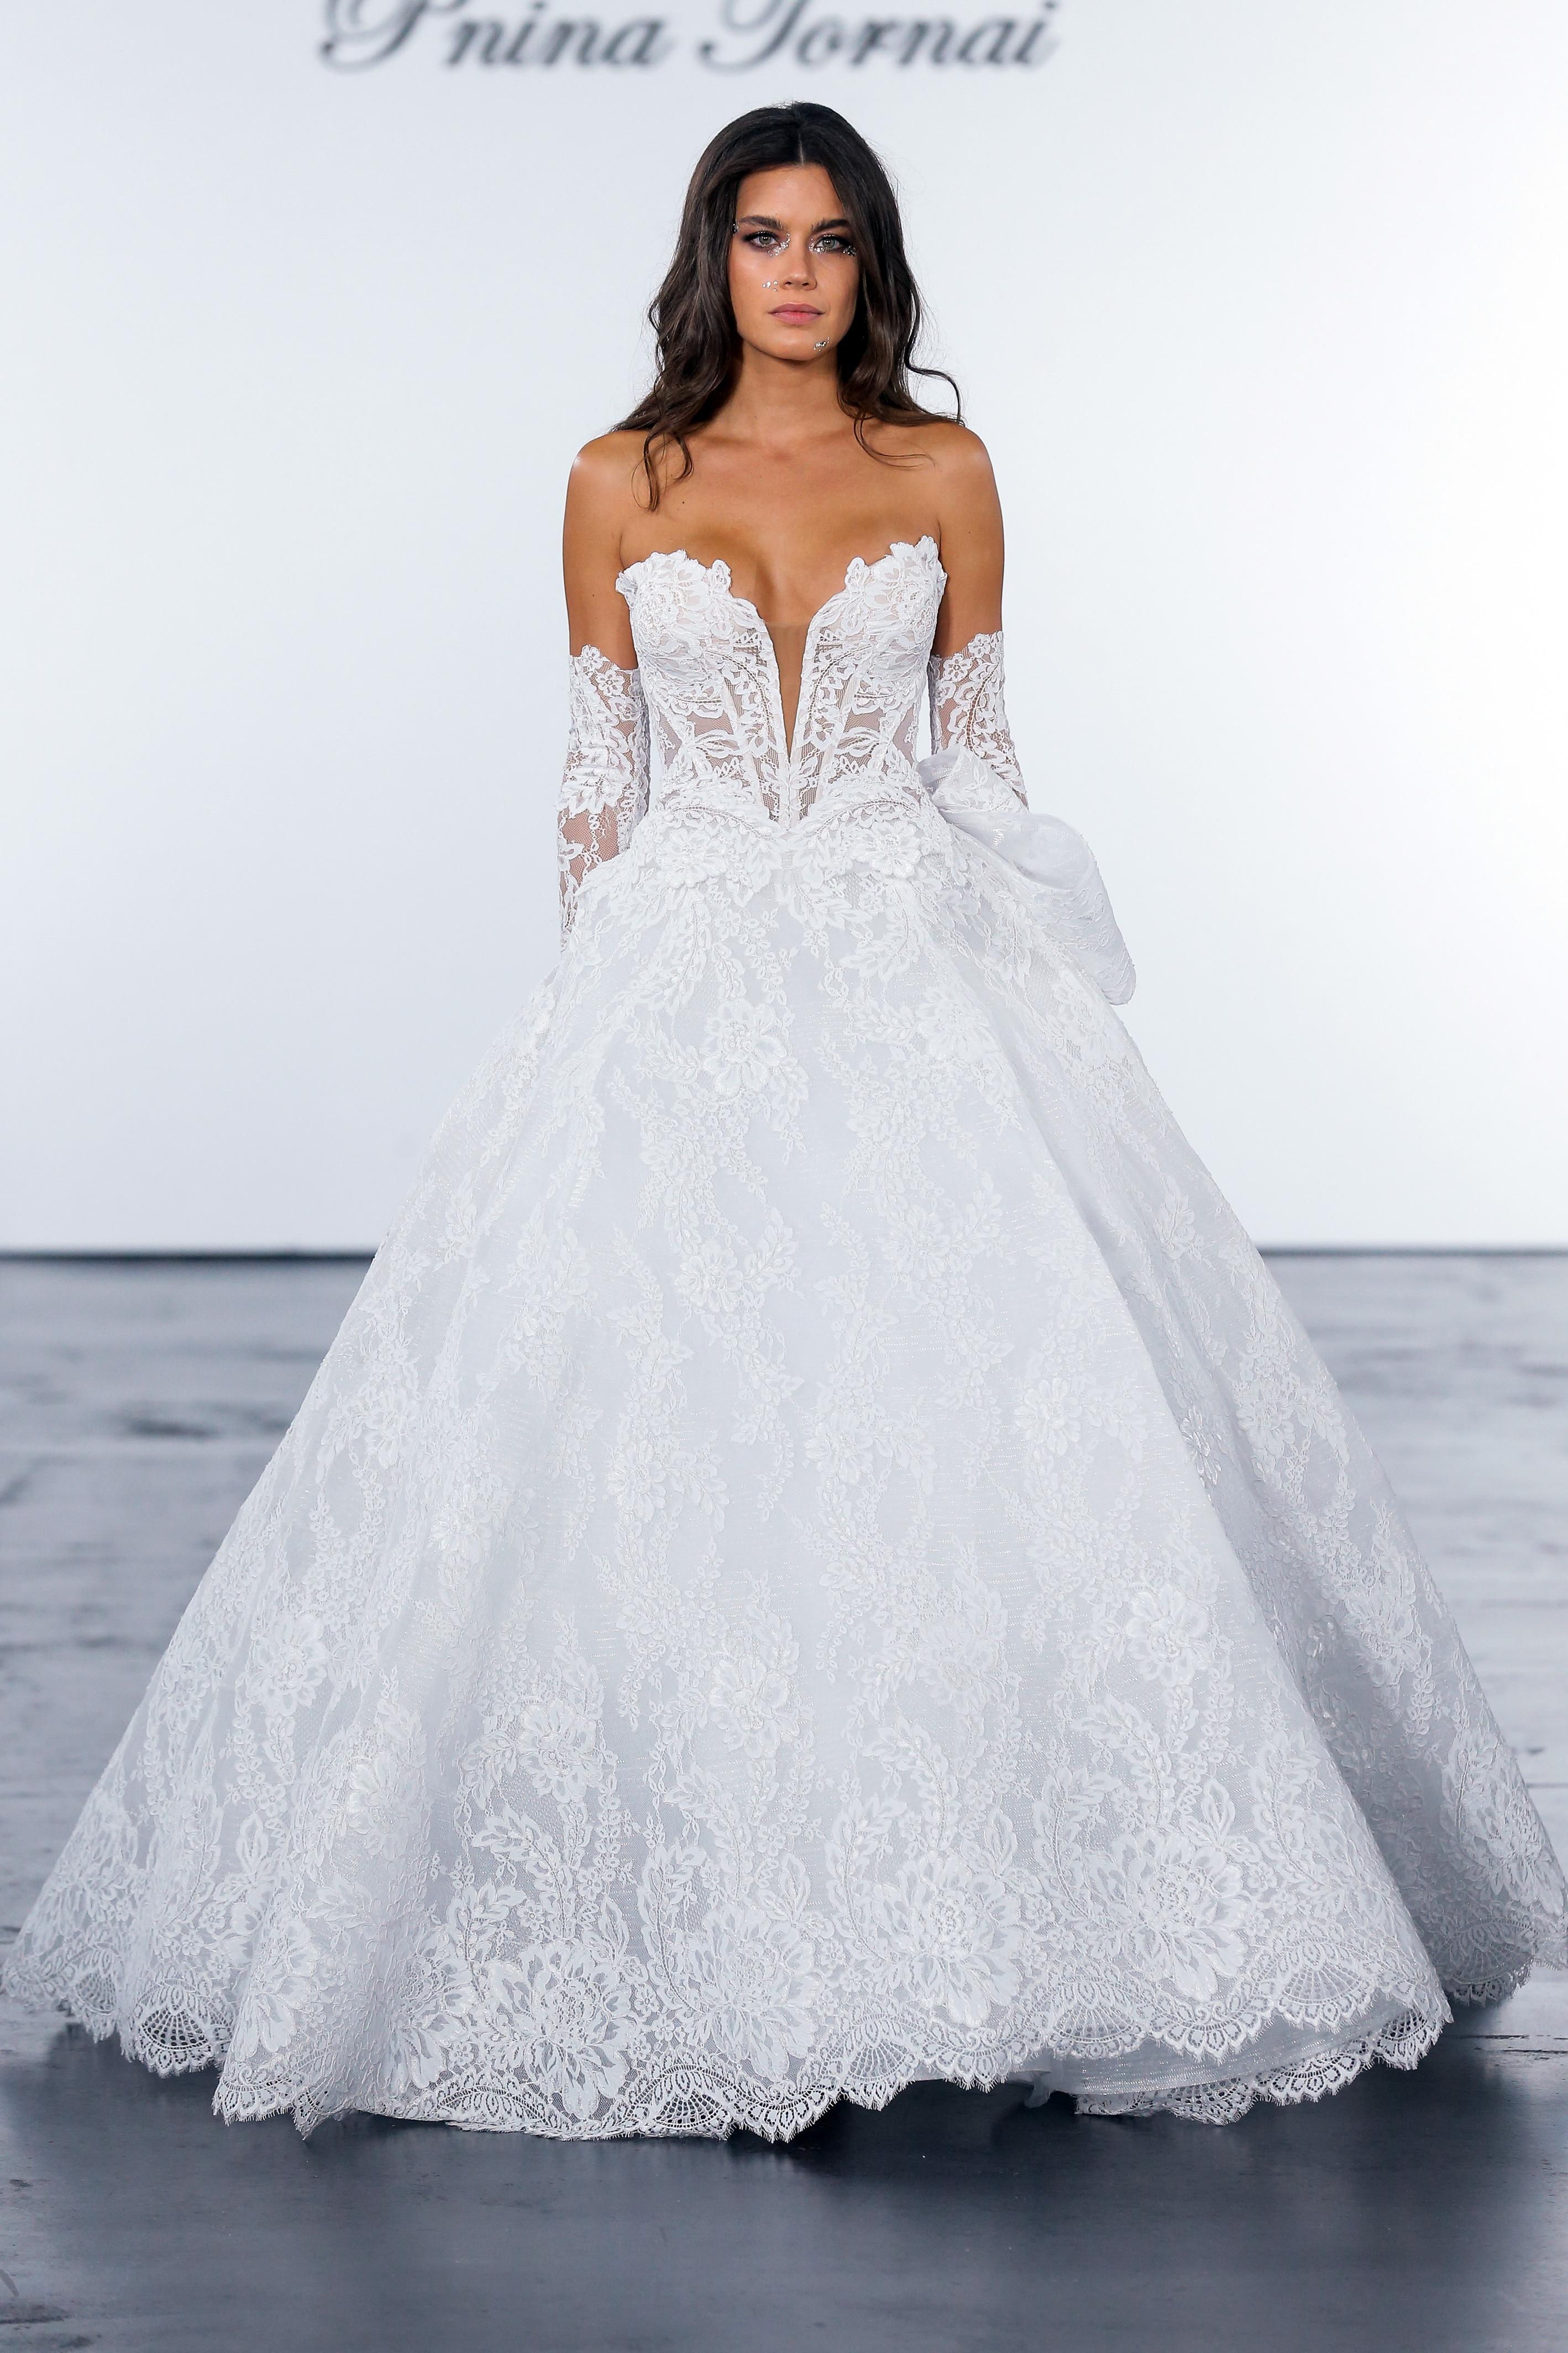 pnina tornai fall 2018 lace wedding ballgown